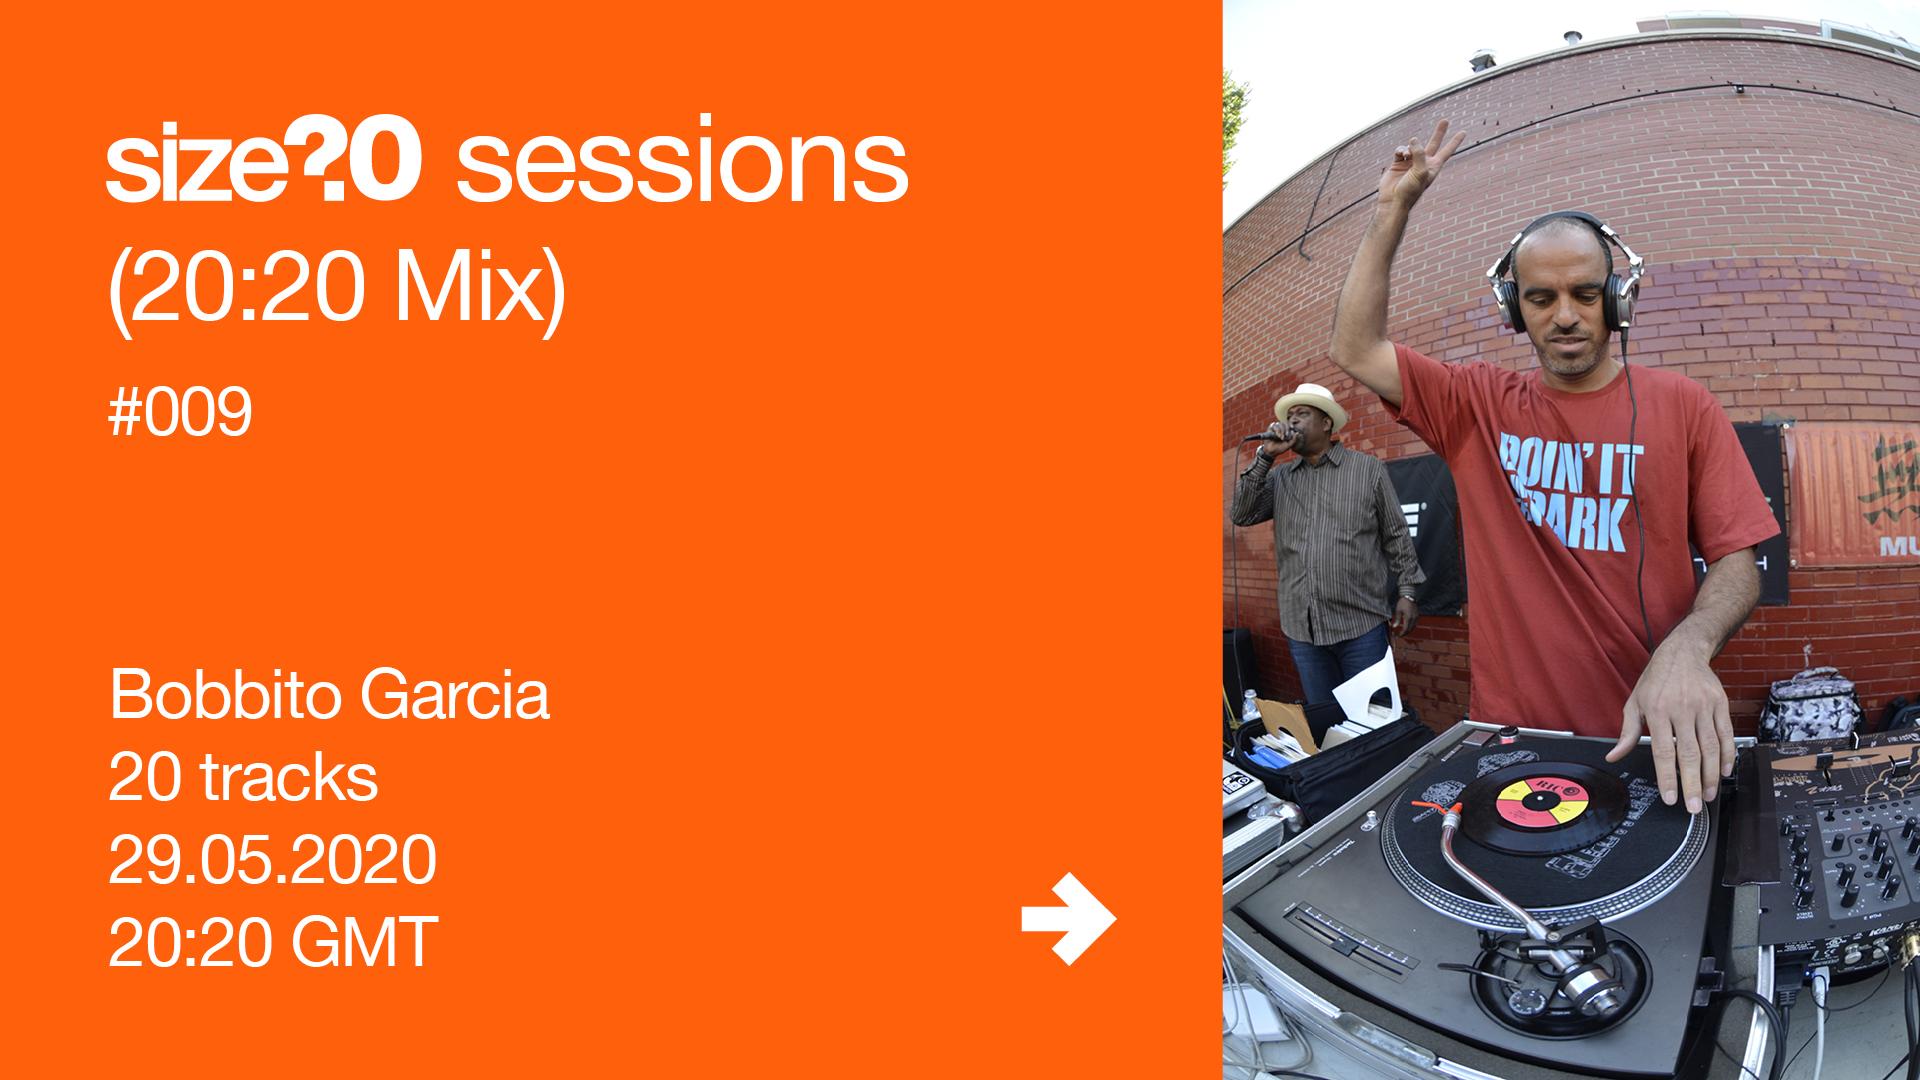 size? sessions (20:20 Mix) #009 – Bobbito Garcia